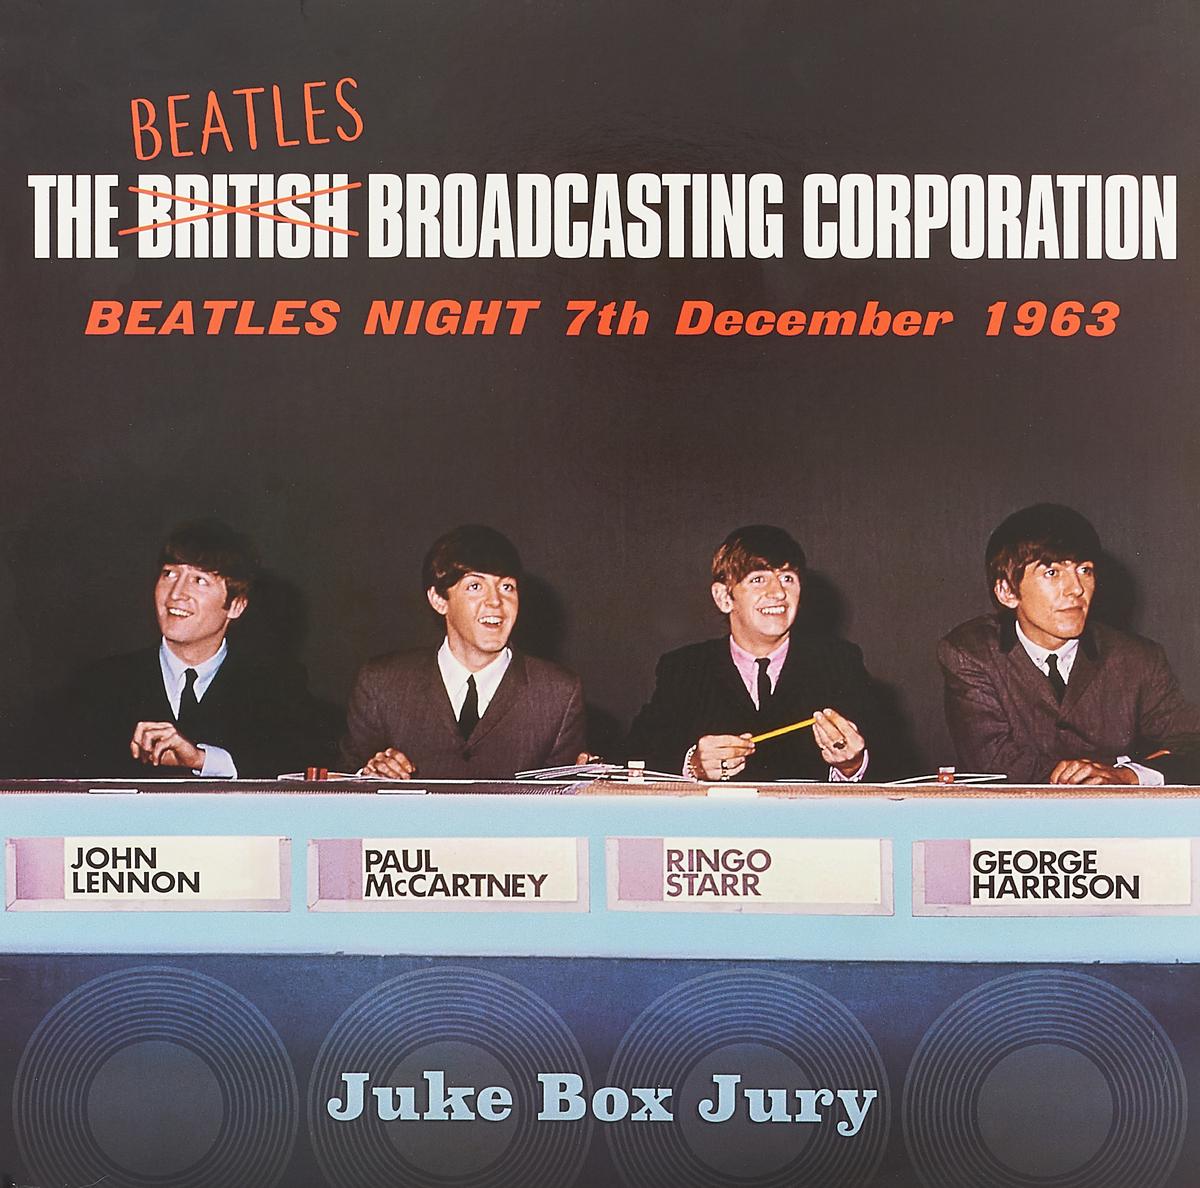 The Beatles The Beatles. Beatles Night 7th December 1963 (LP) издательство аст the beatles иллюстрированная биография